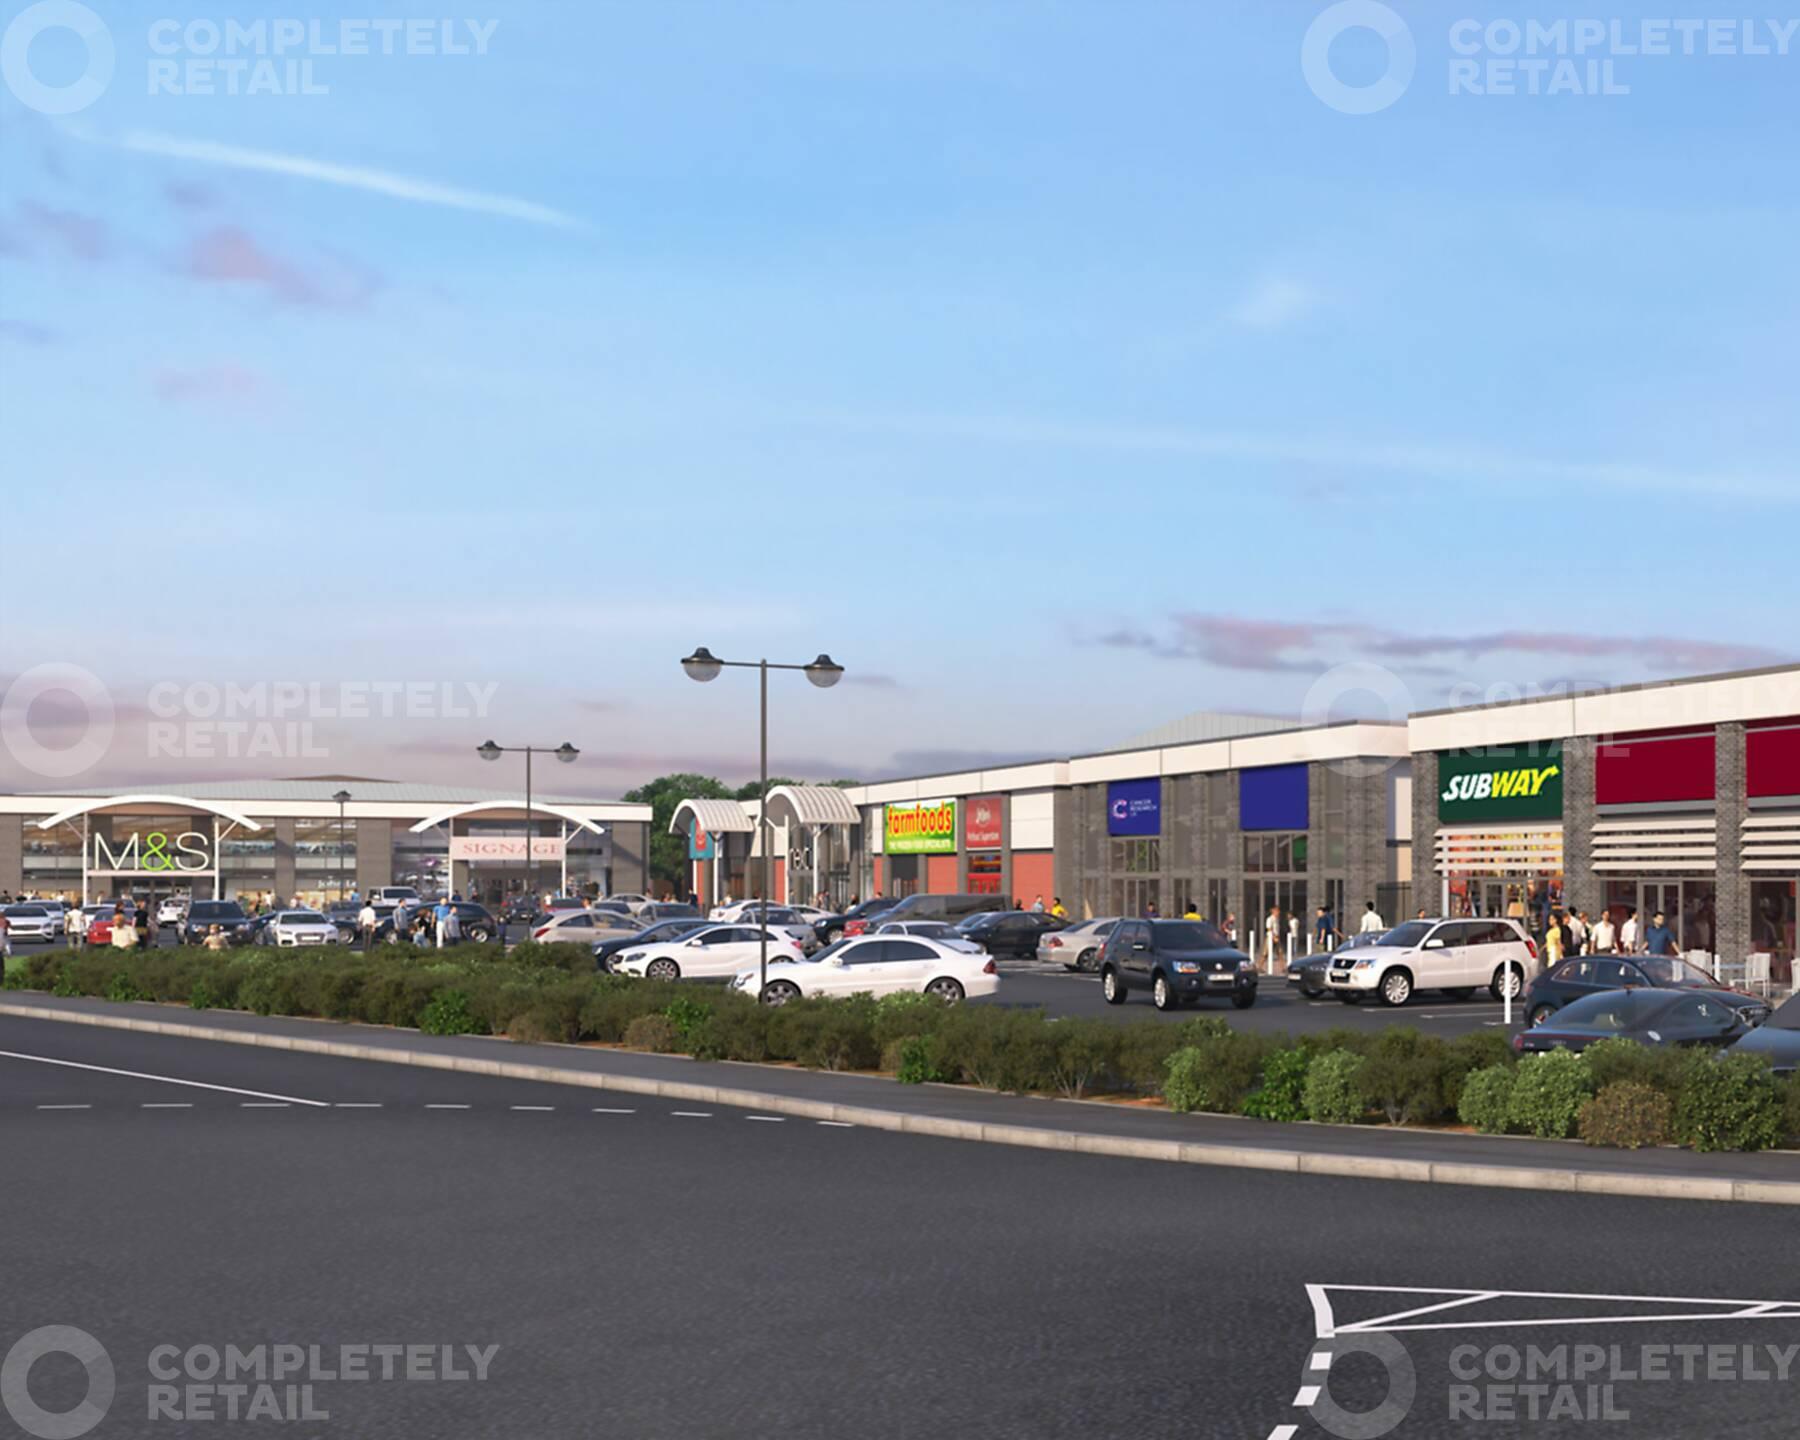 Bridgwater Retail Park